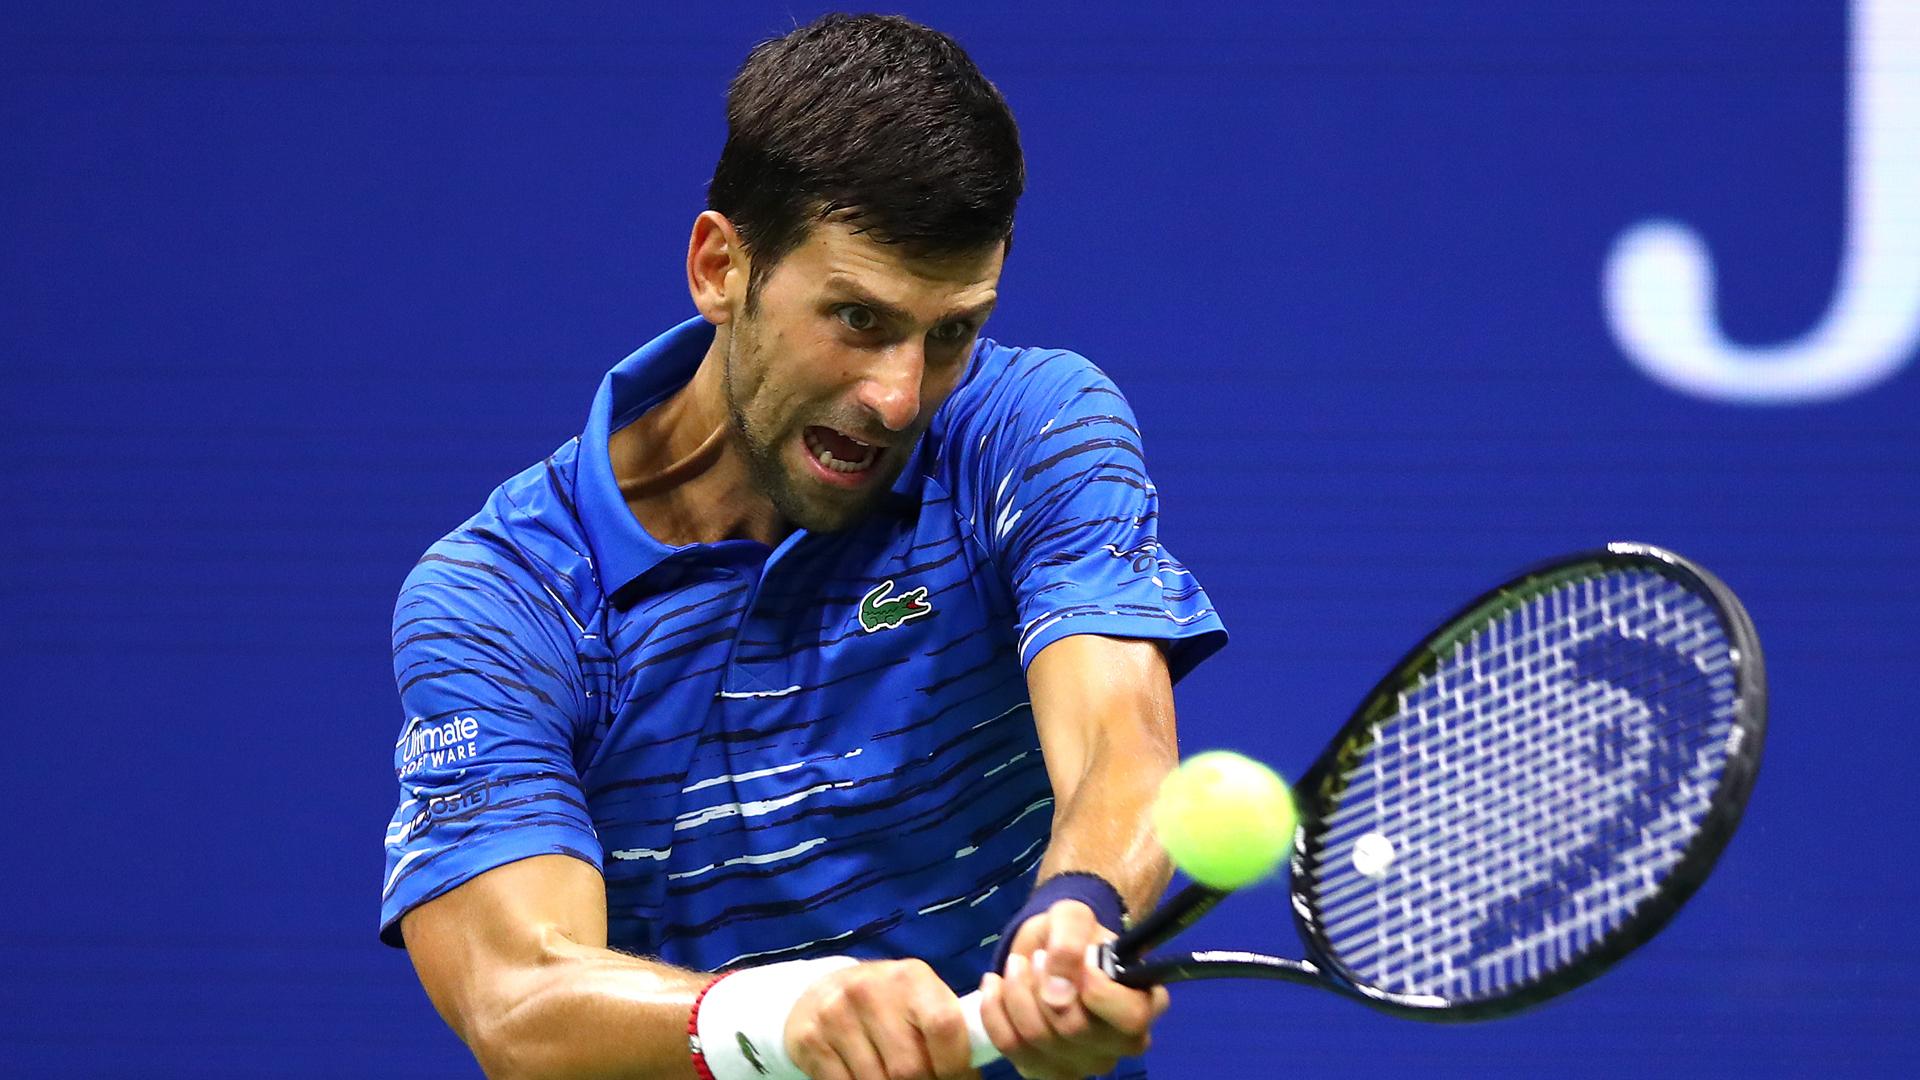 U S Open 2019 Novak Djokovic Struggles With Shoulder Injury In Win Over Juan Ignacio Londero Sporting News Canada